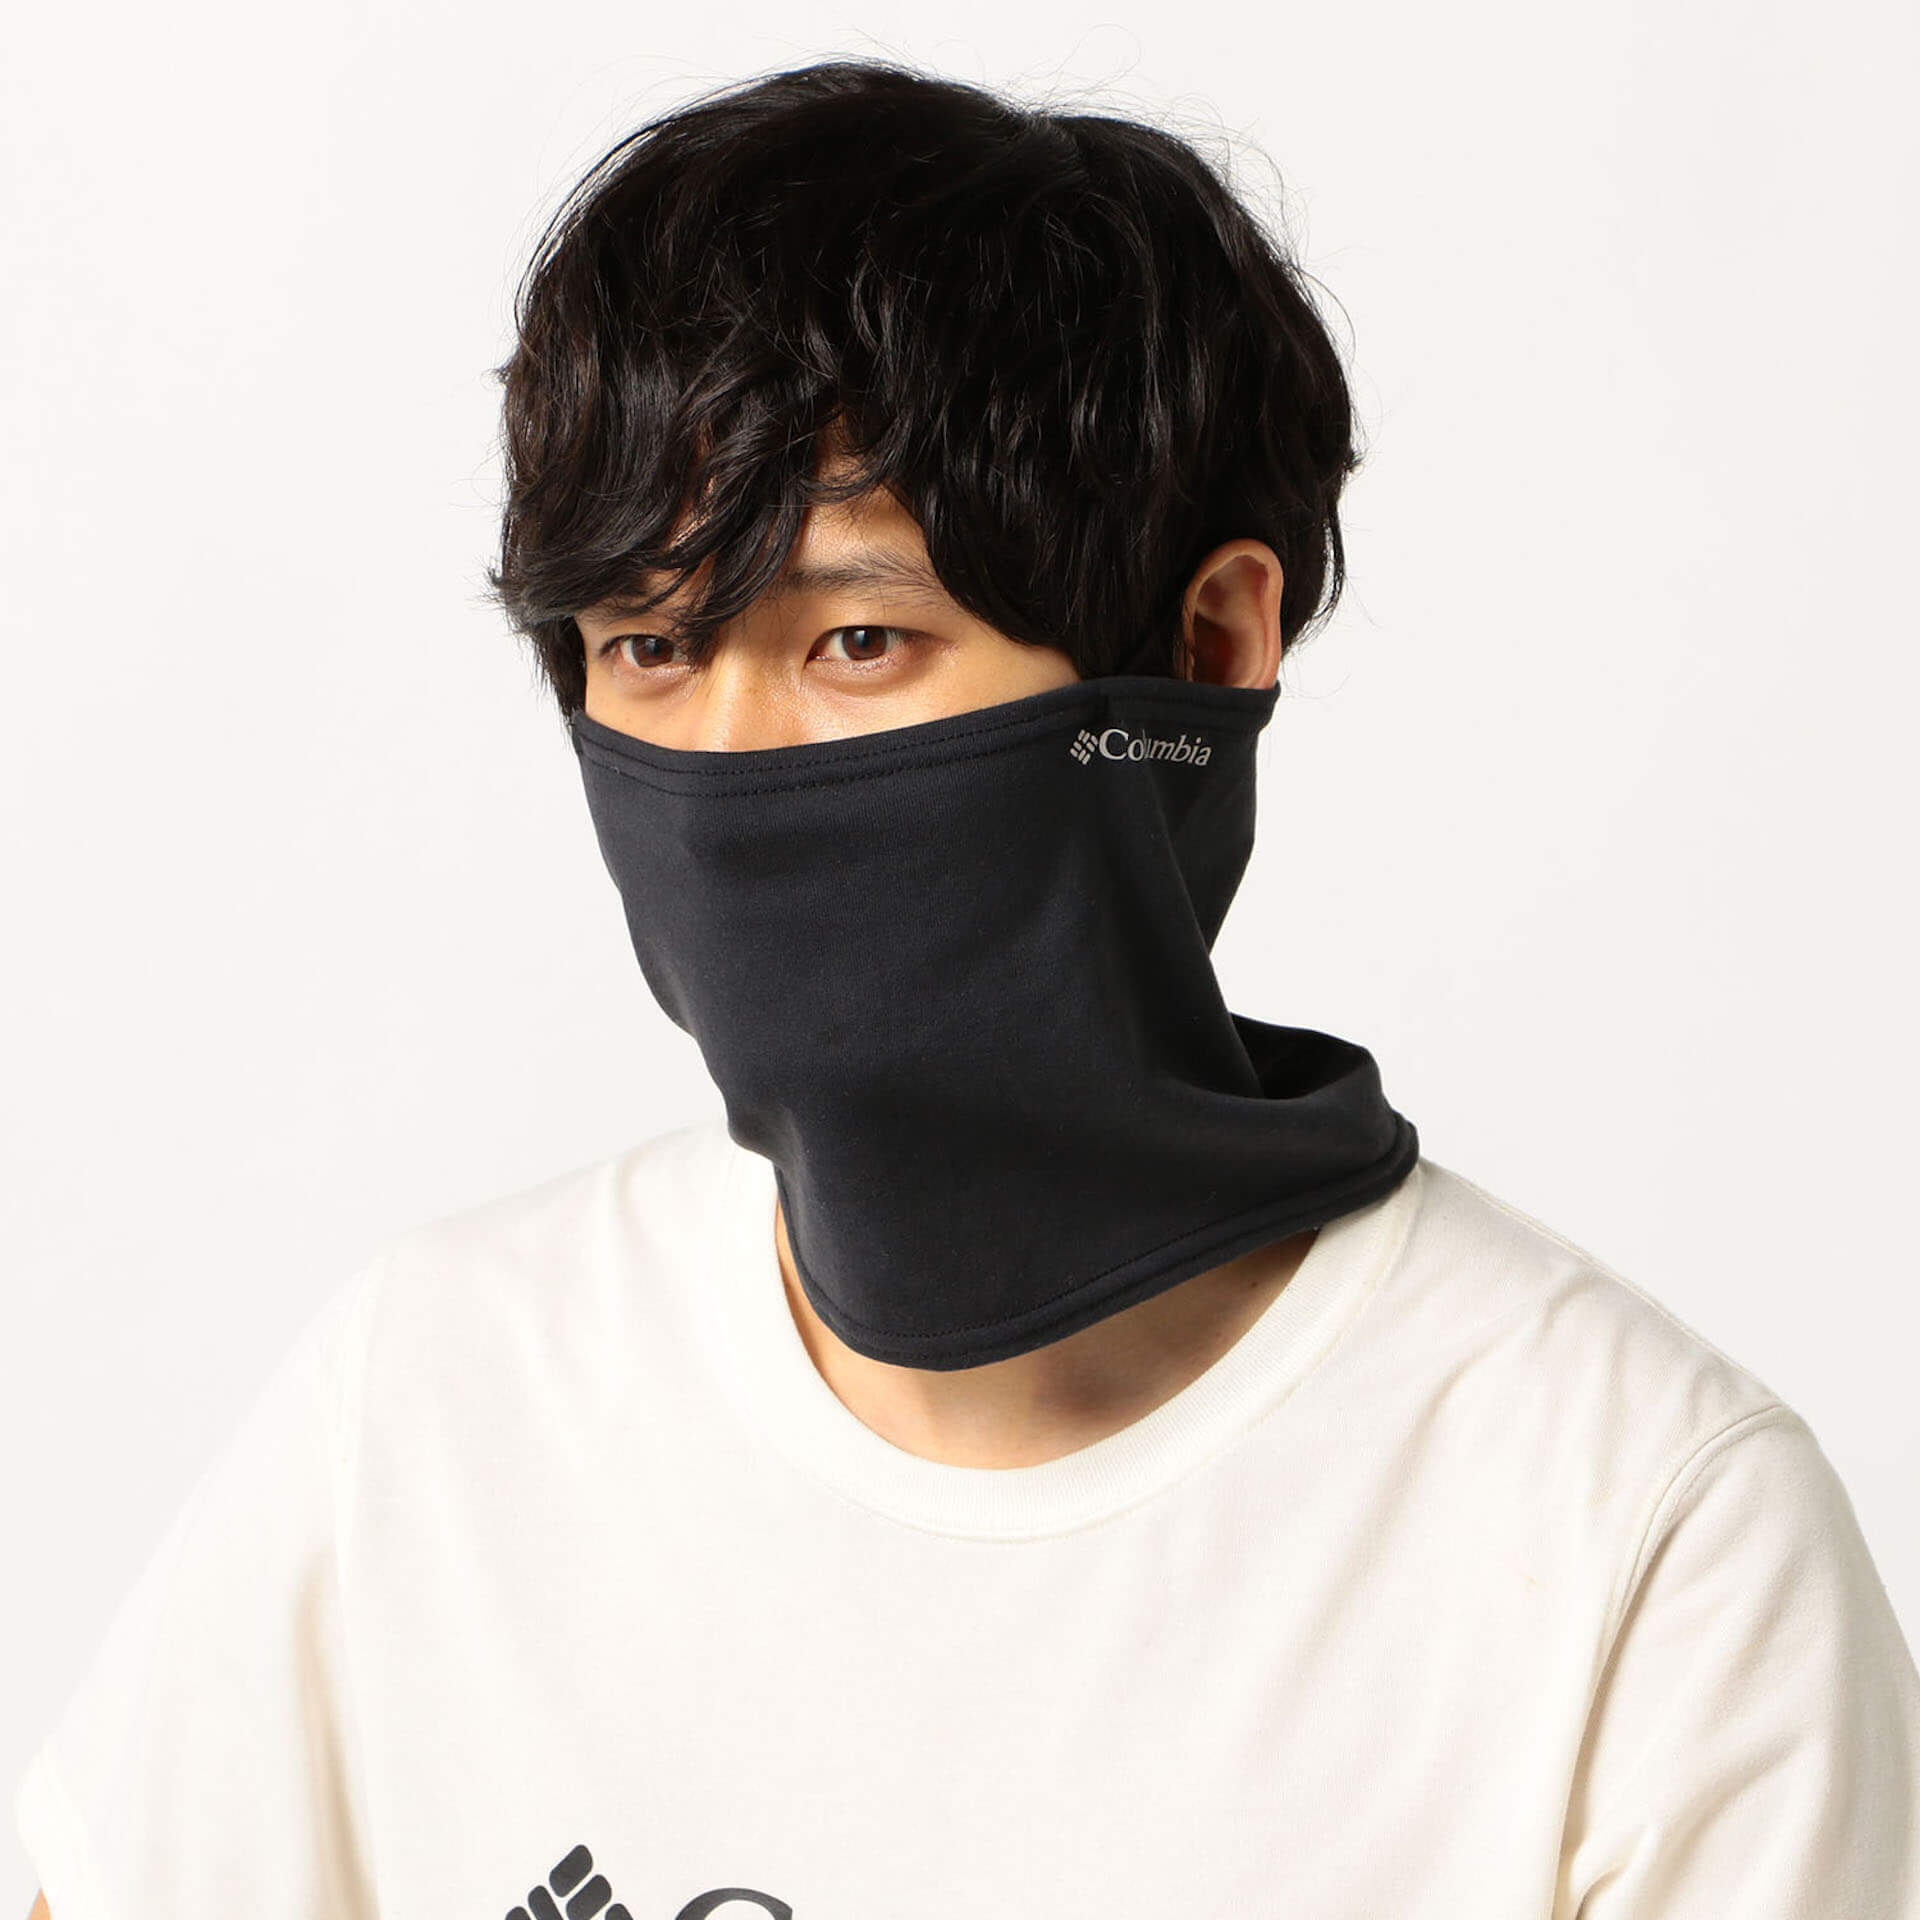 Columbiaからマスクがわりにも最適なネックガード2種が発売決定!汗が冷却効果をもたらす「オムニフリーズゼロ」搭載 life200721_columbia_mask_9